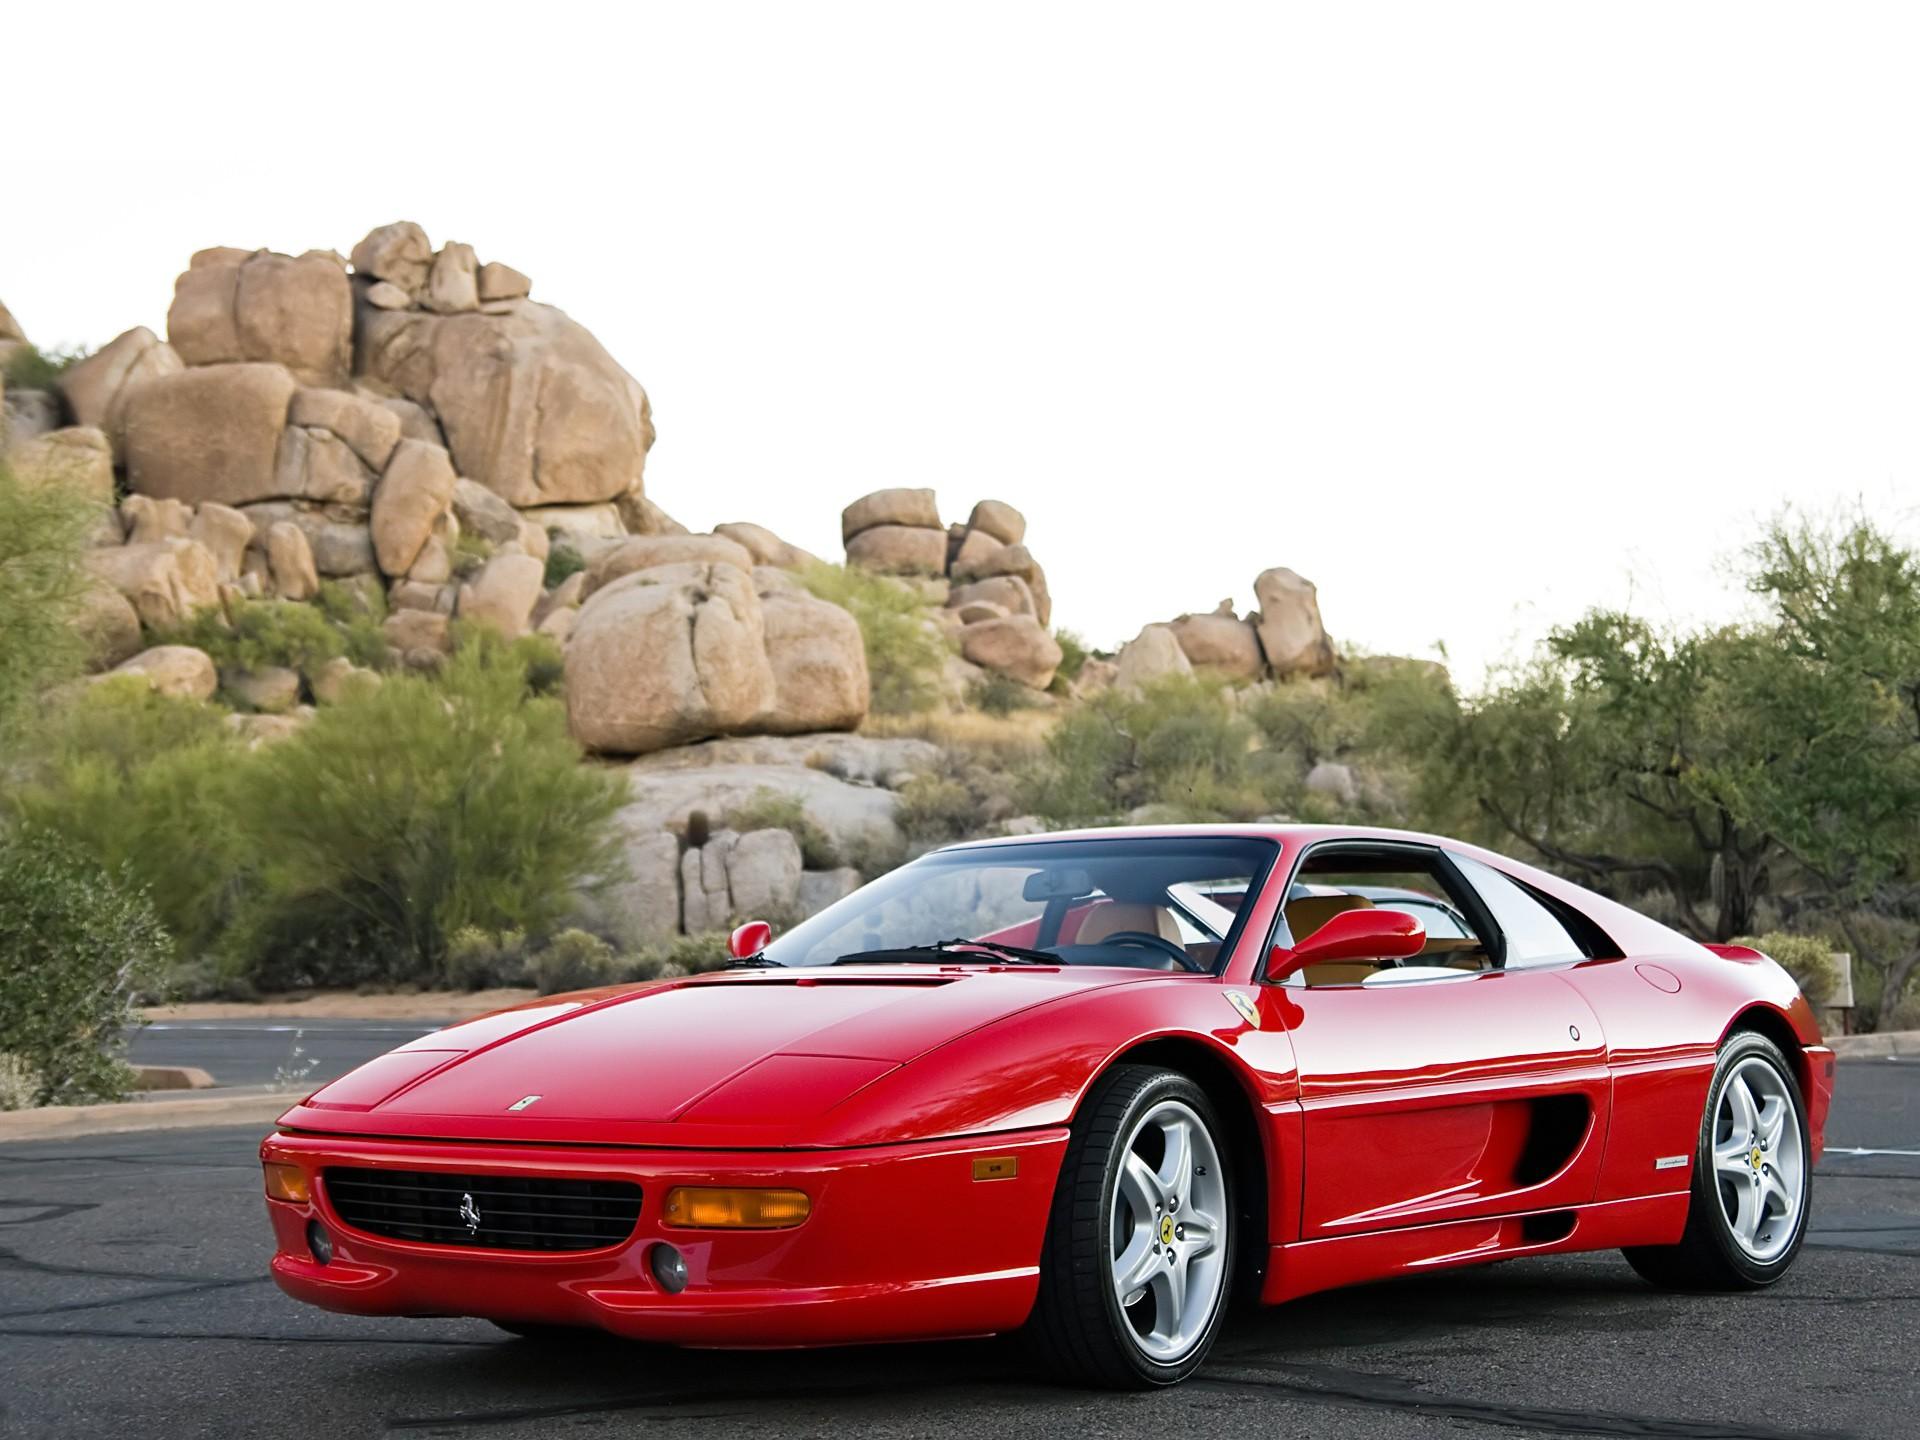 Ferrari F40 For Sale >> FERRARI F355 specs & photos - 1994, 1995, 1996, 1997, 1998, 1999 - autoevolution